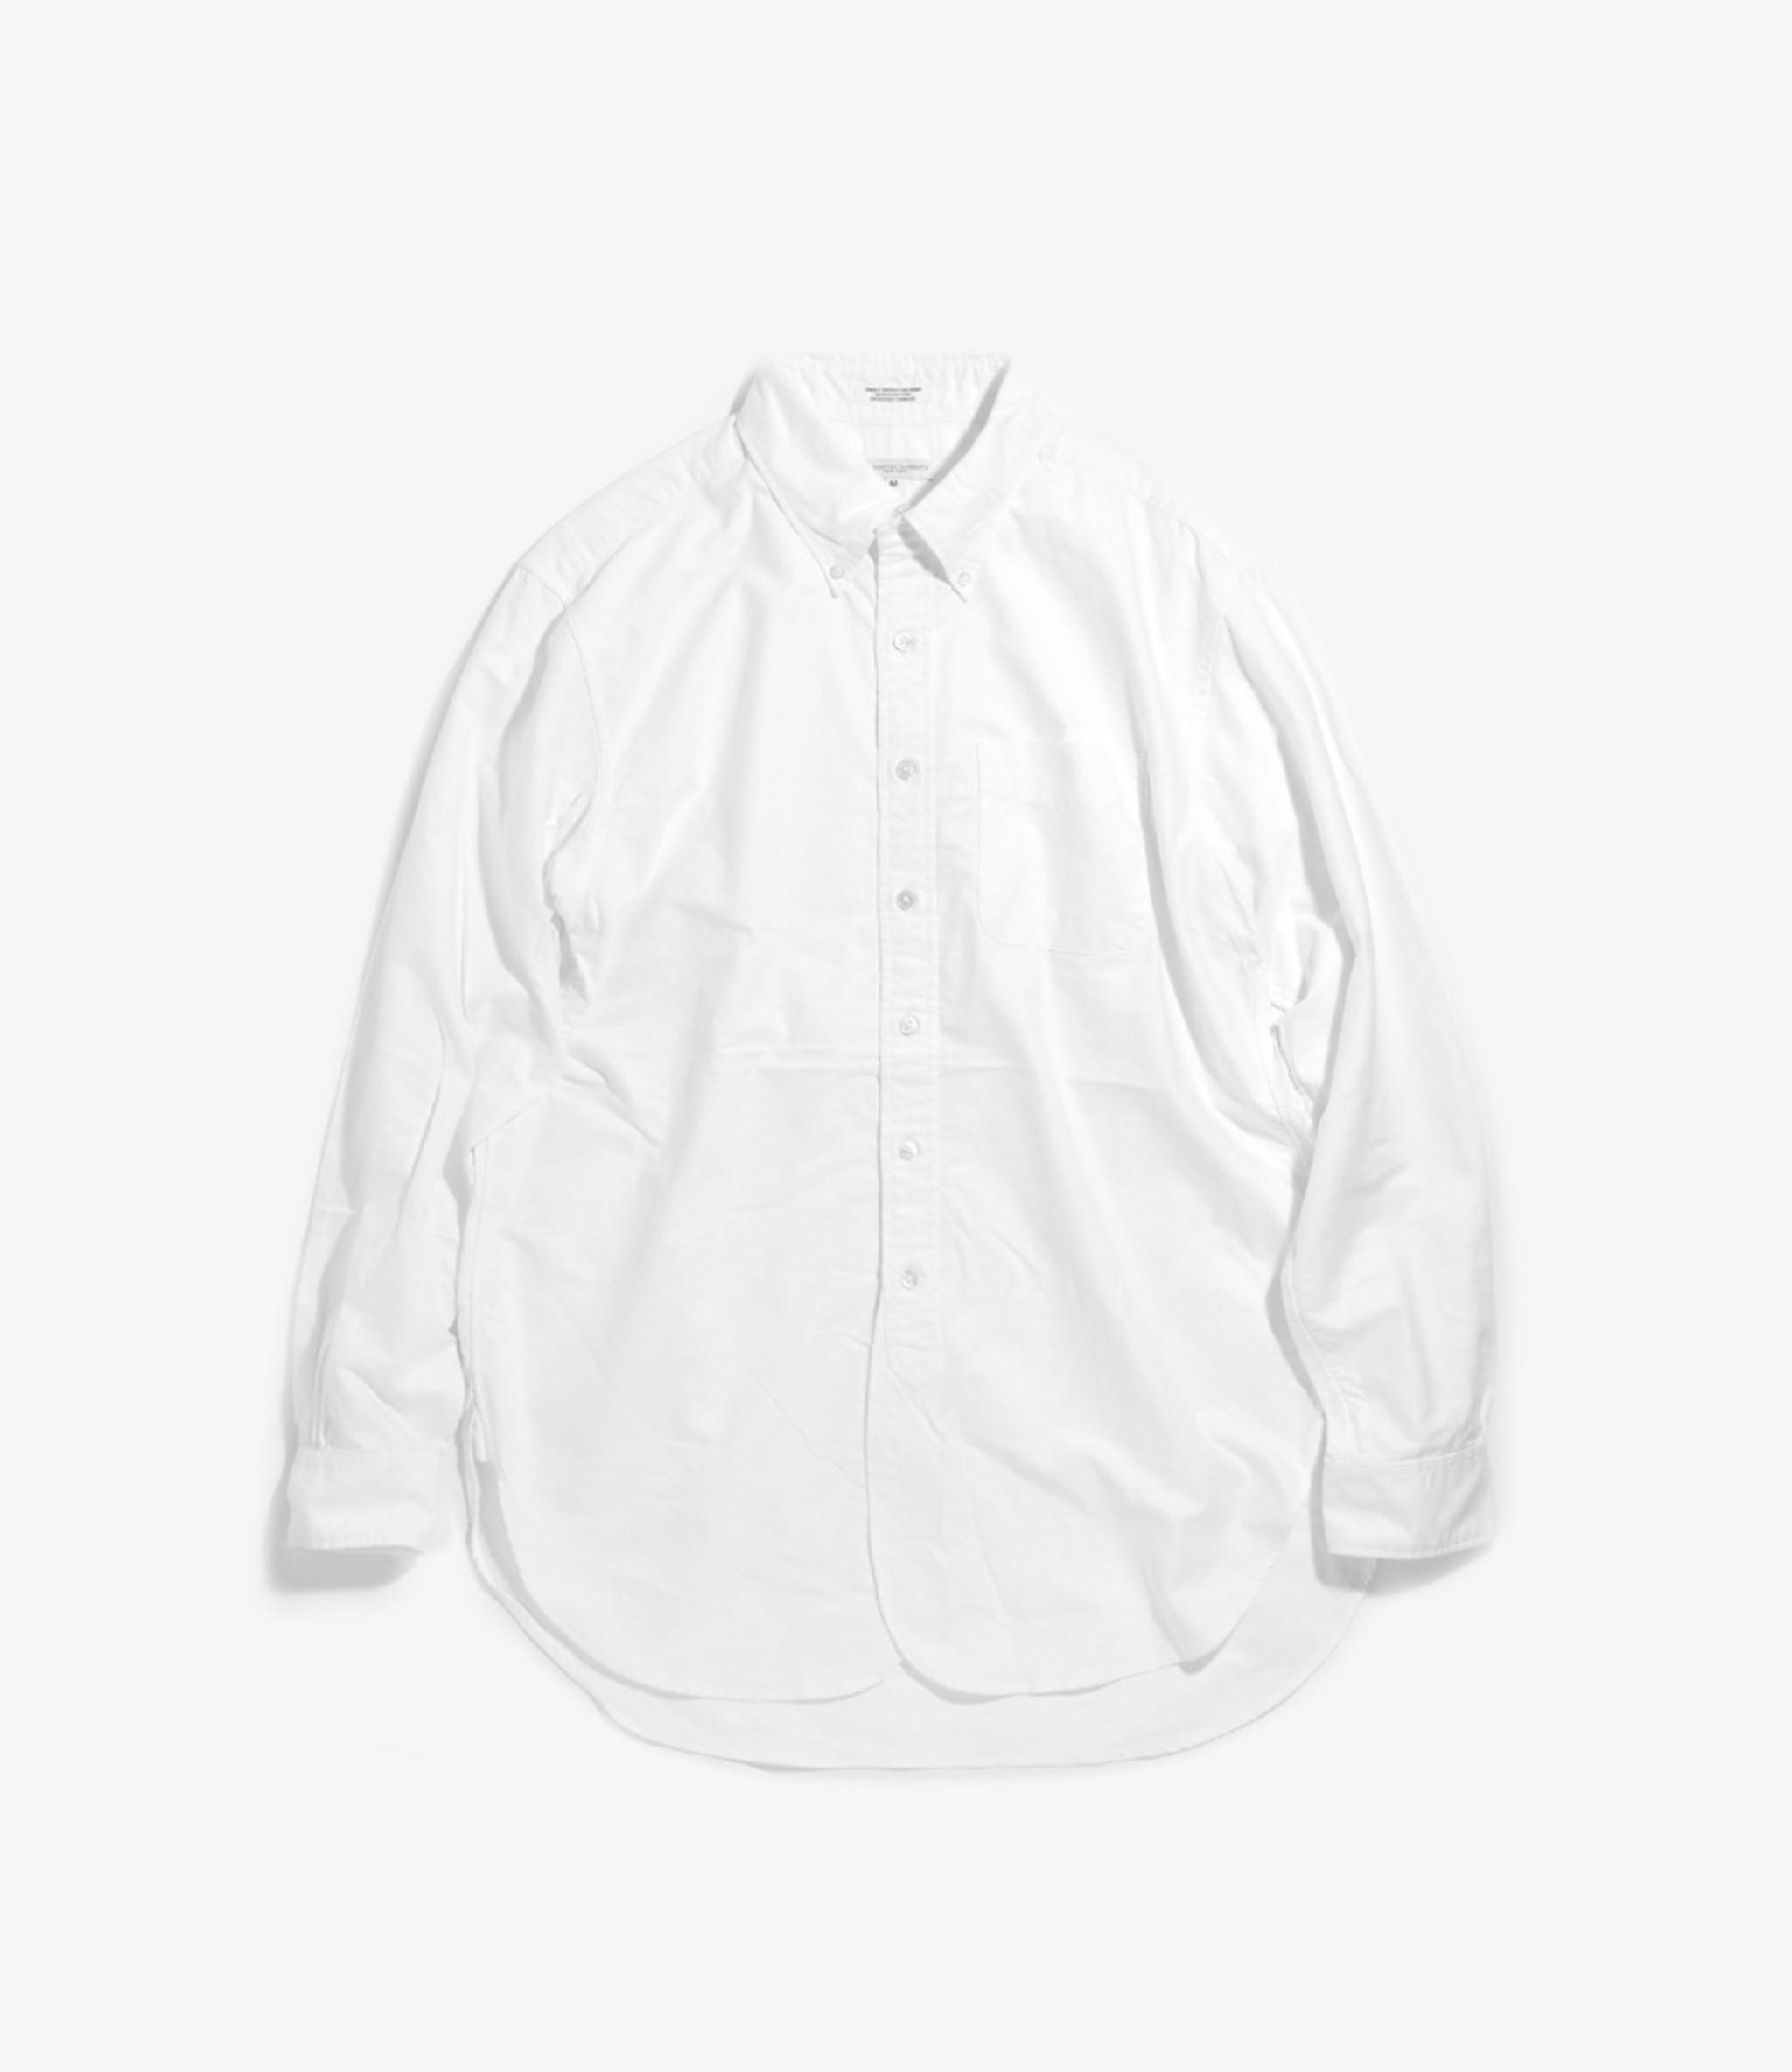 Engineered Garments 19 Century BD Shirt - White Cotton Oxford